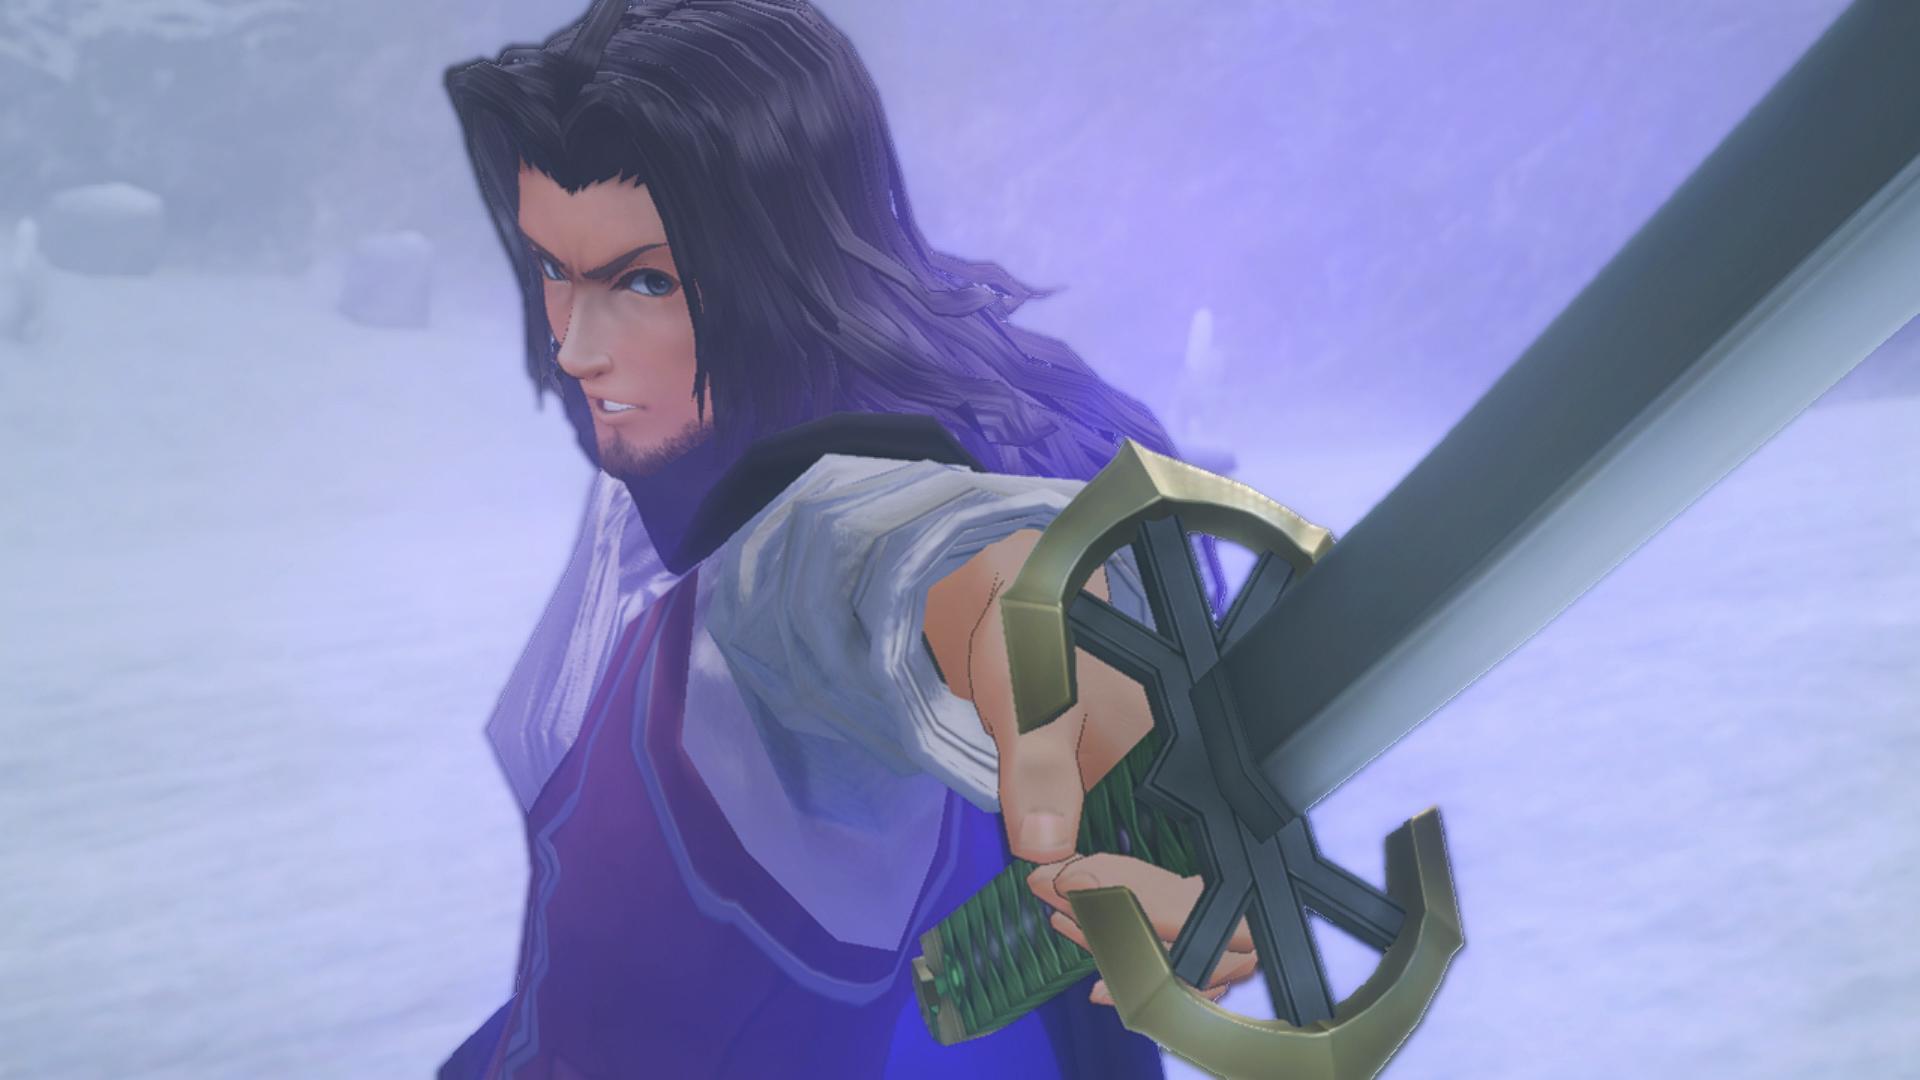 EZtWrCCUYAA8B6j - 【疑問】ゼノブレこれオープニングの剣の上まで行くの?